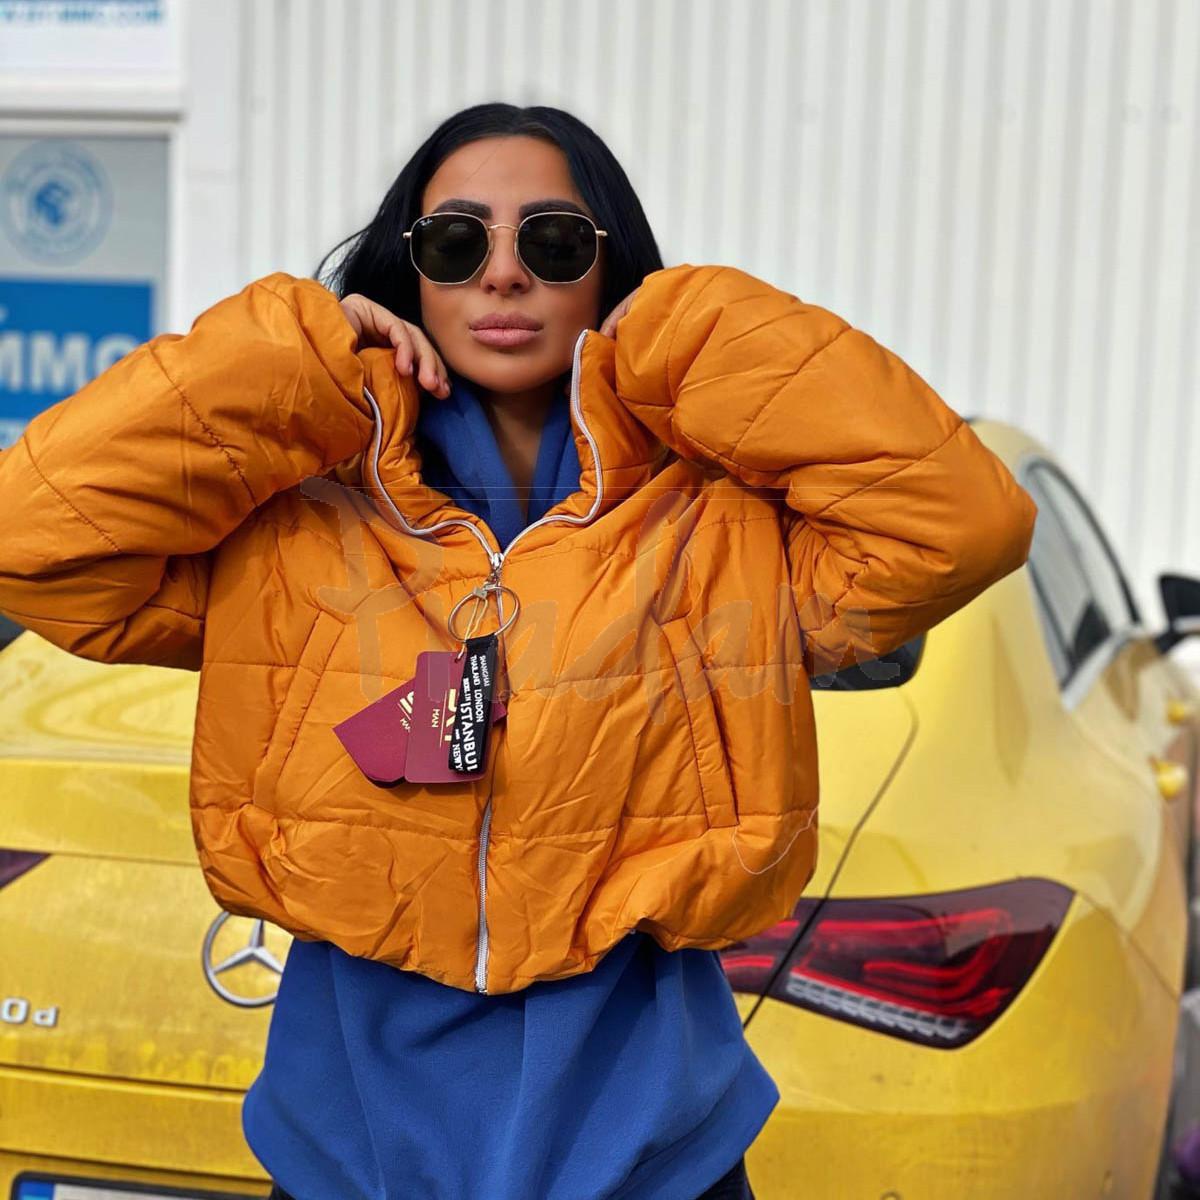 81288-7 горчица SRT куртка женская на синтепоне (4 ед. размеры:S.M.L.XL)